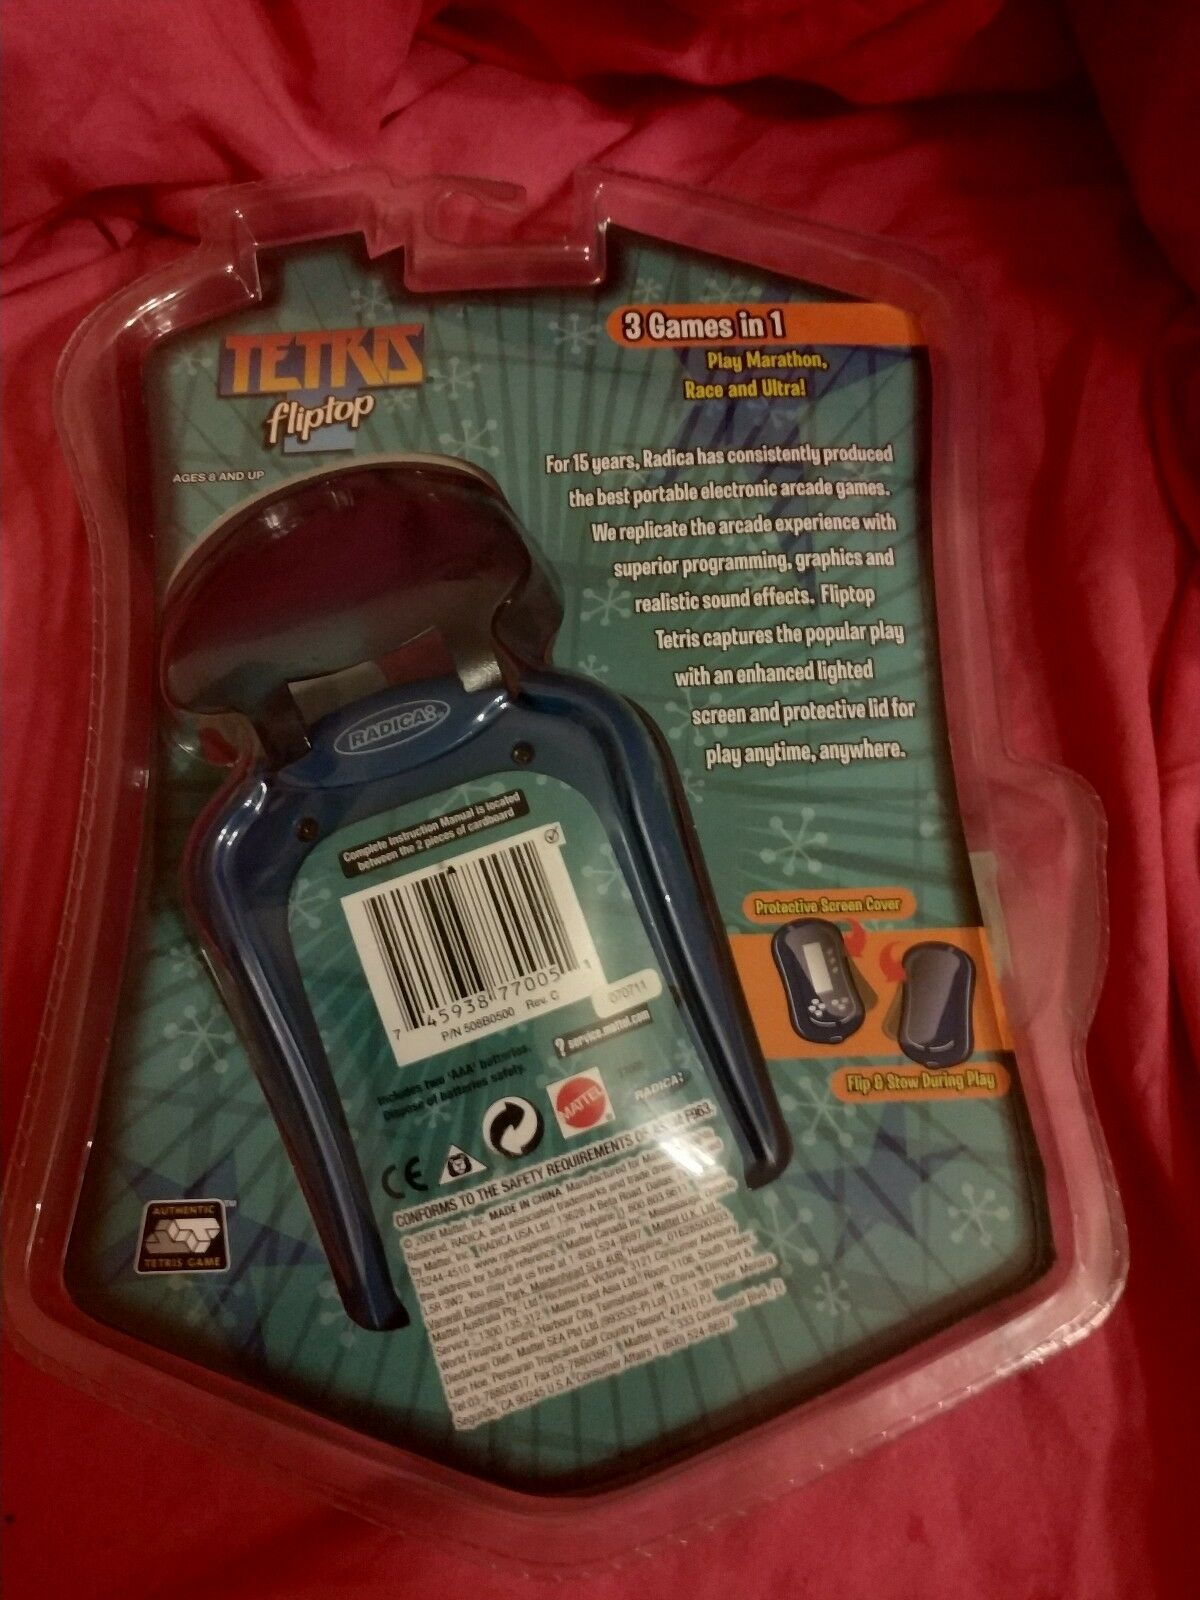 Mattel 2006 Handheld Tetris Fliptop Game radica radica radica ultra rare collectable L@@K 763dd6